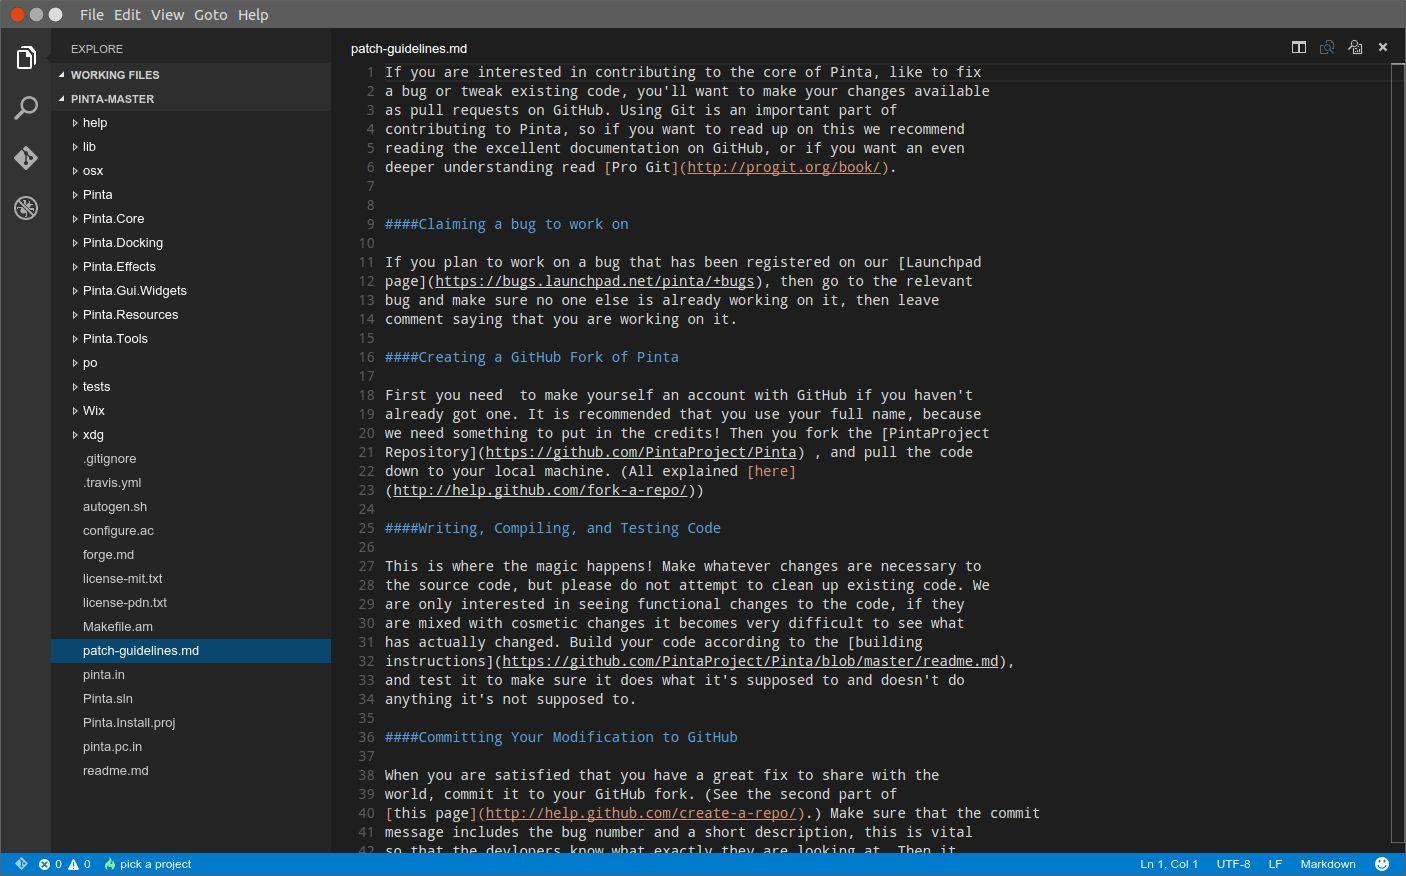 microsoft-visual-studio-code_1_174191.jpg